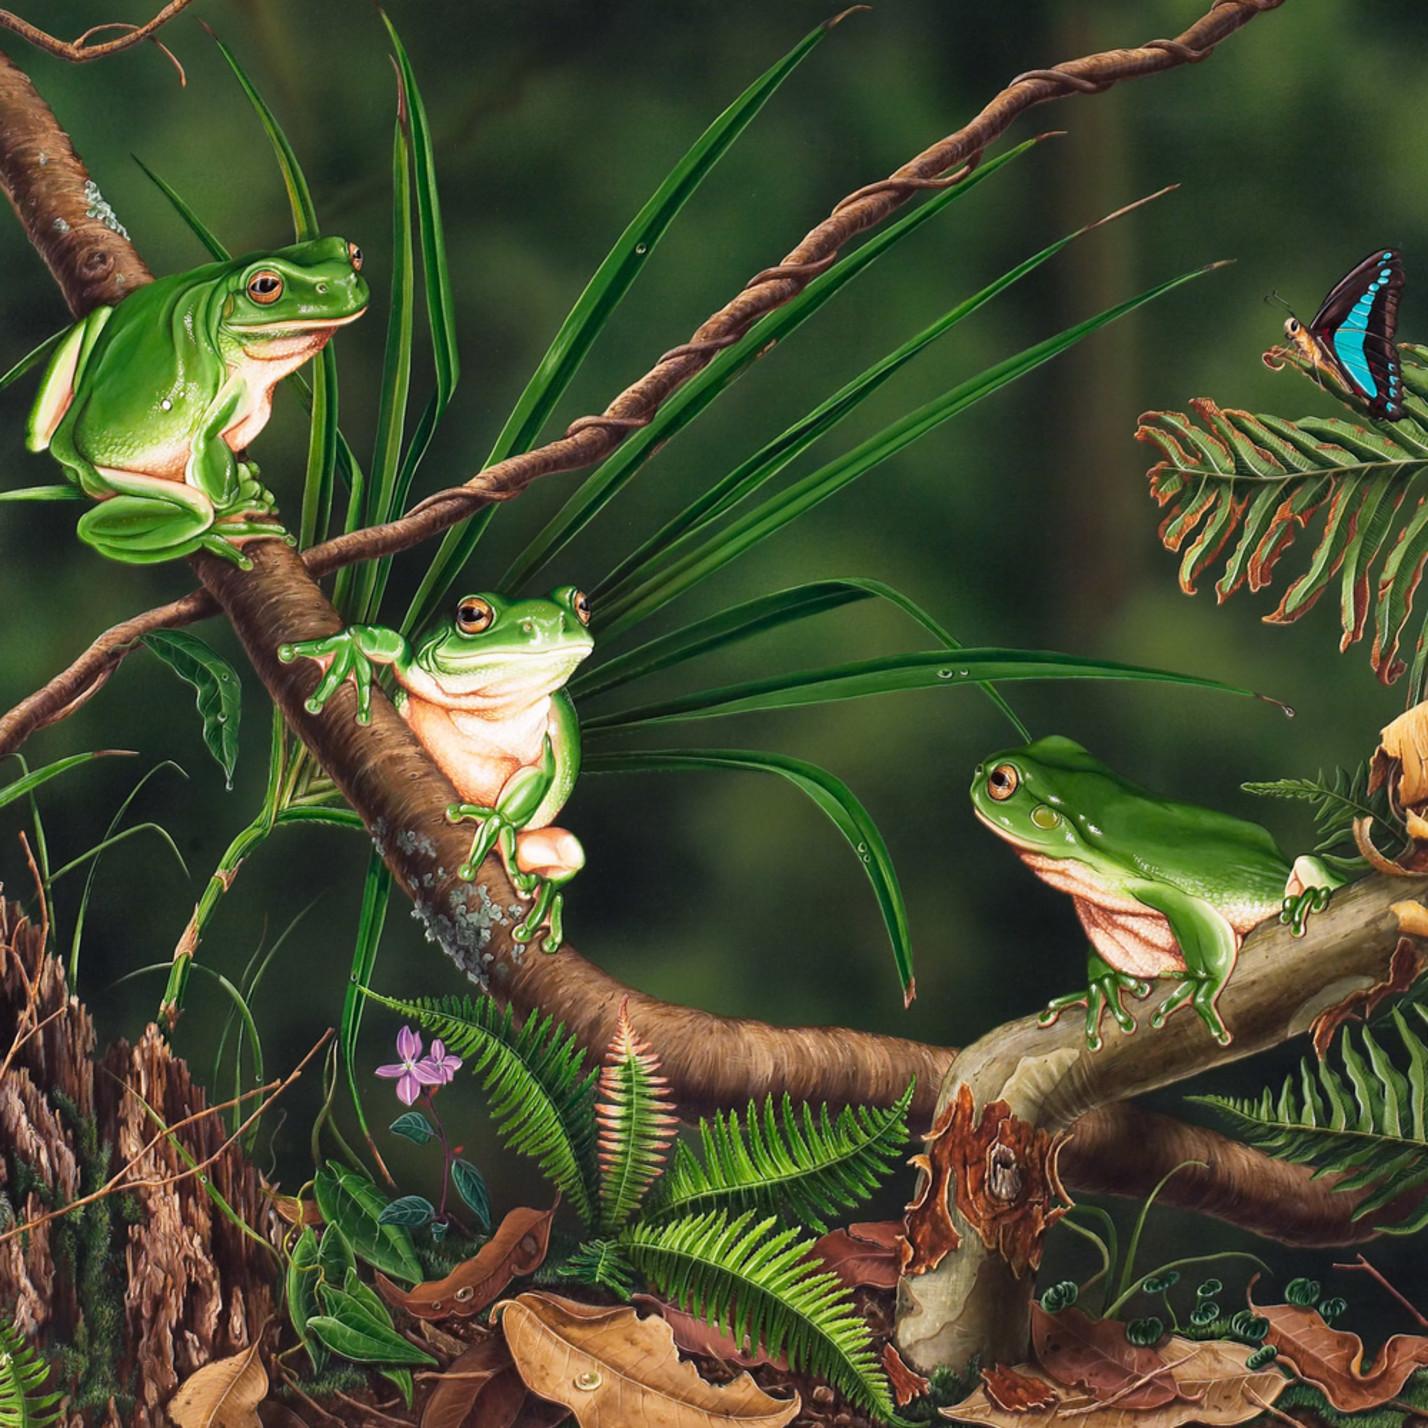 Midnight chat   common green tree frogs natalie jane parker australian native wildlife hz2bai